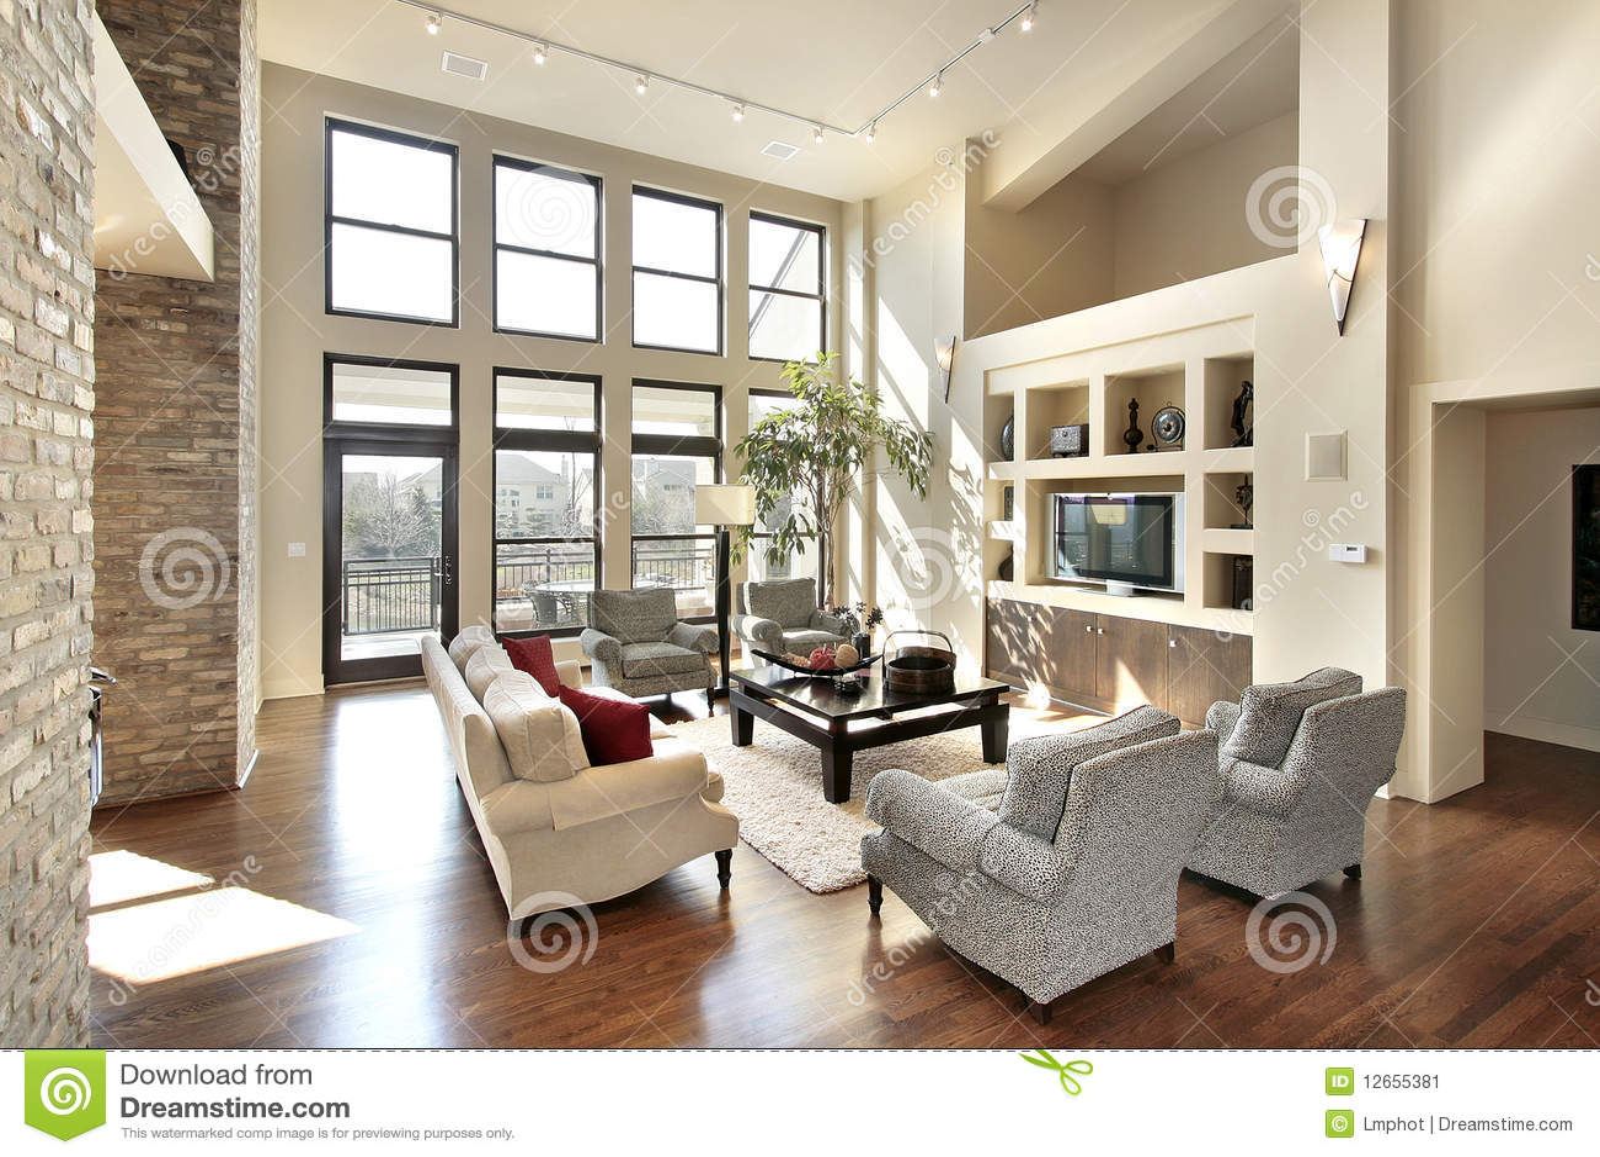 Family Room In Open Floor Plan Stock Image Image 12655381